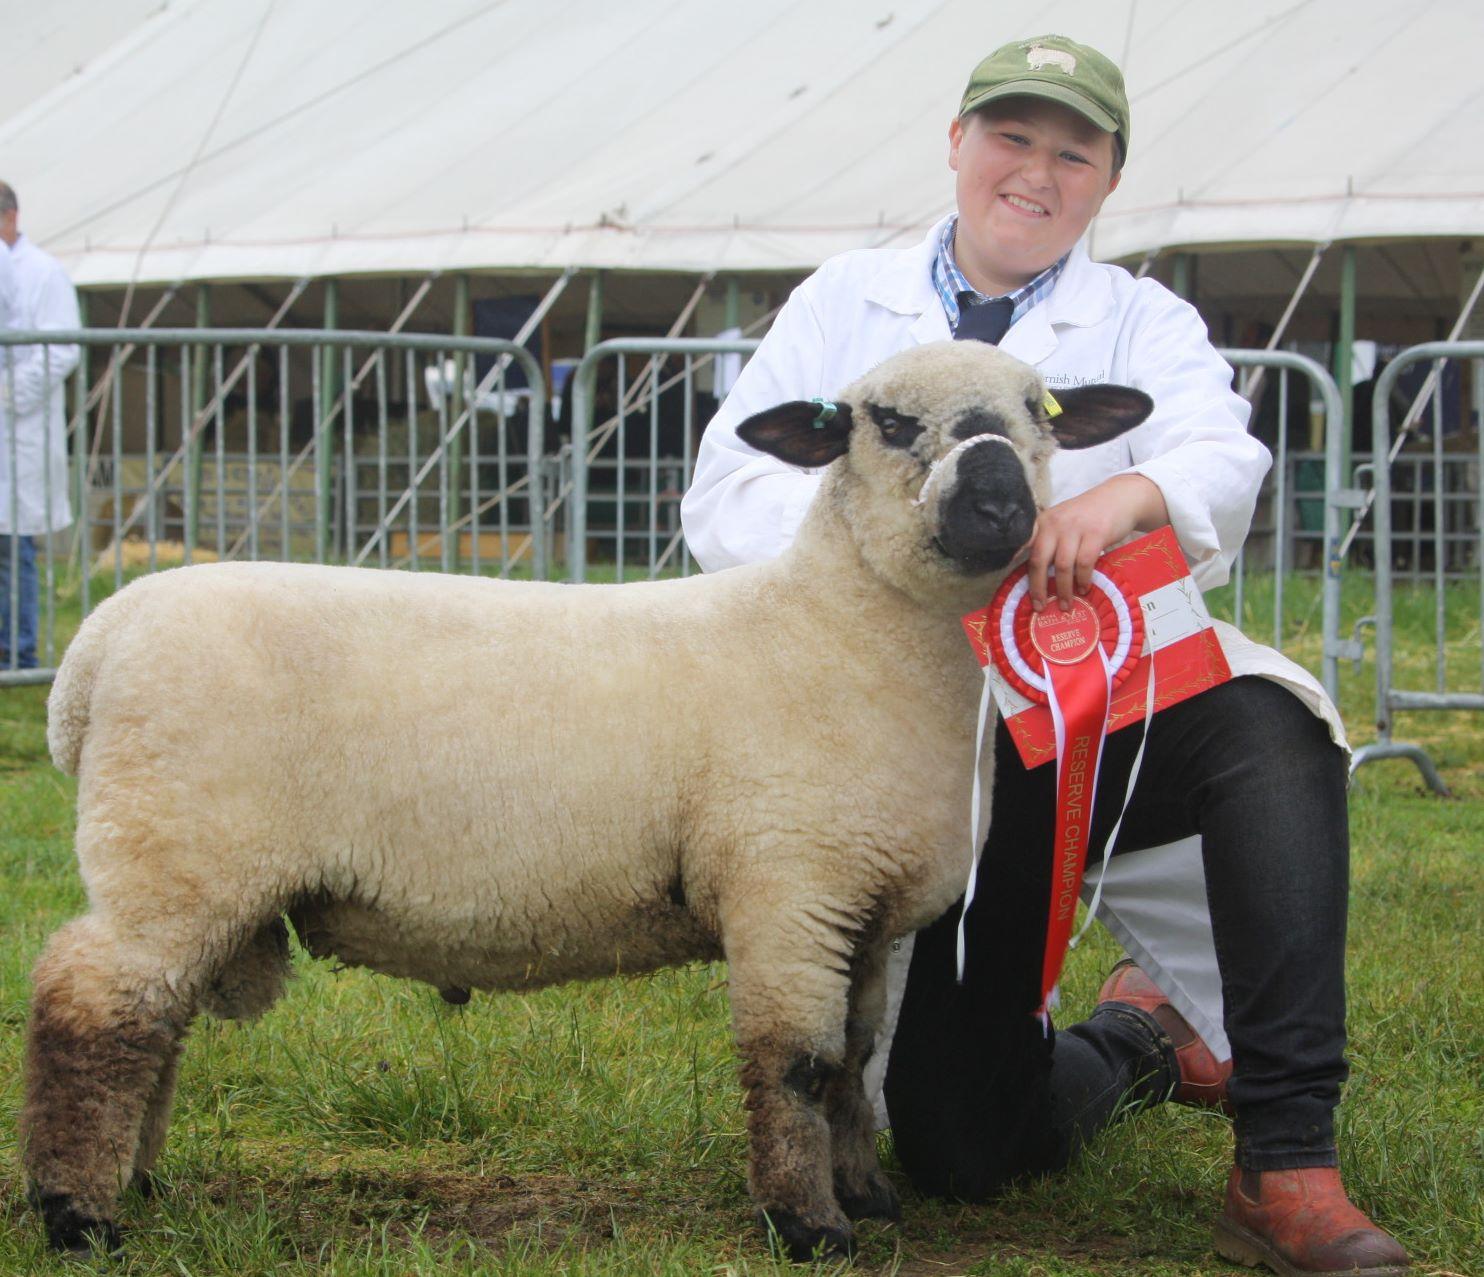 Richard Rundle with Reserve Champion Ram Lamb